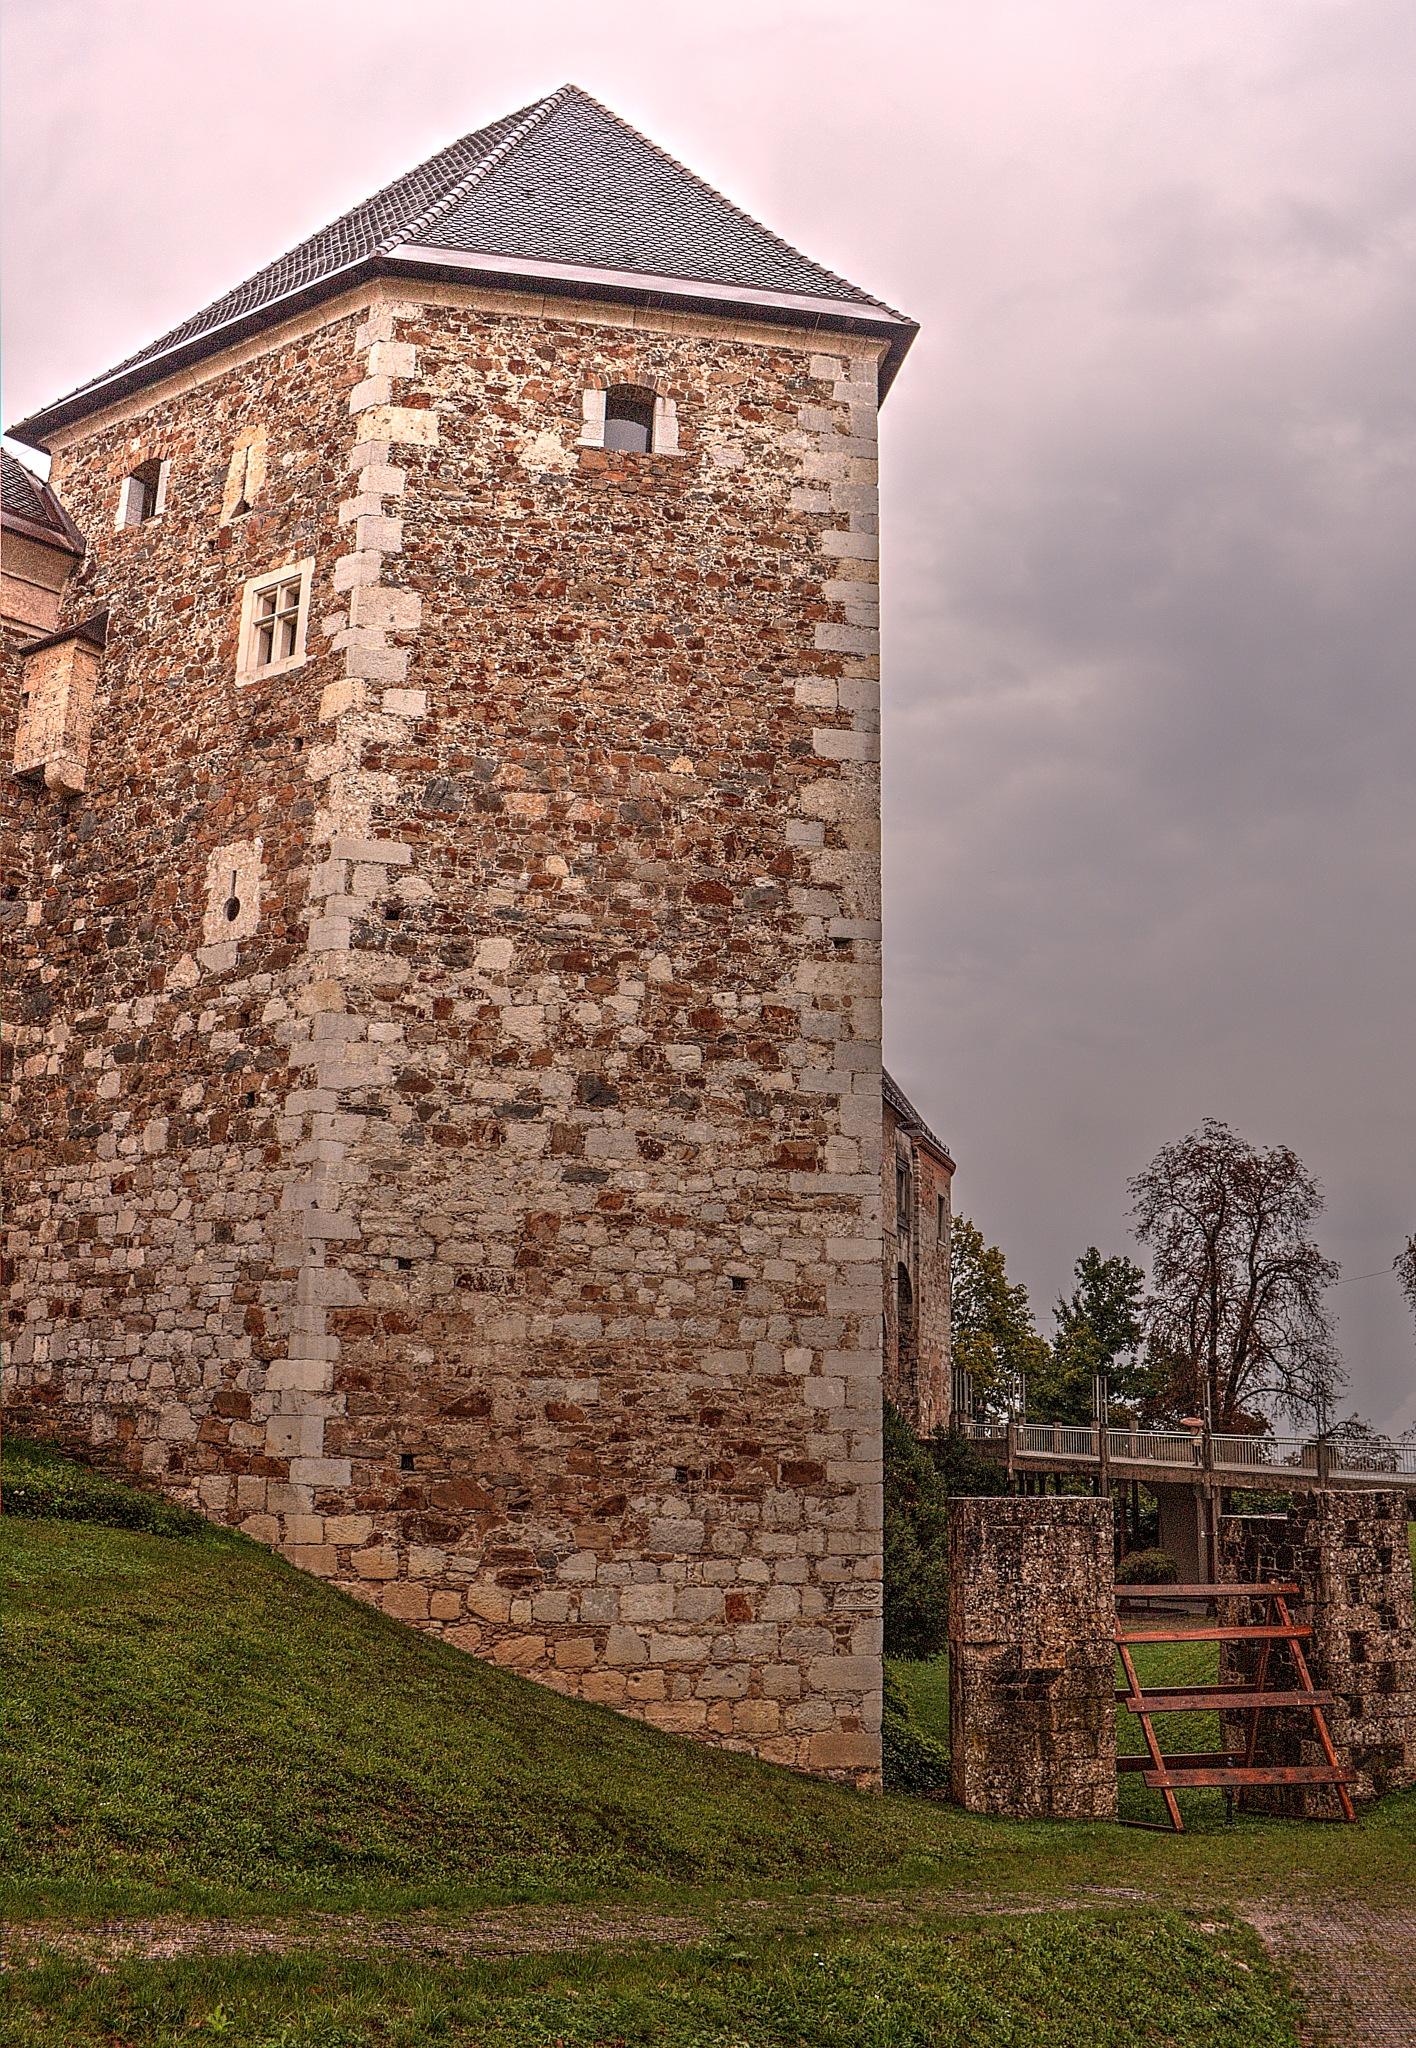 View of Ljubljana Castle, rainy day. by zvnktomasevic